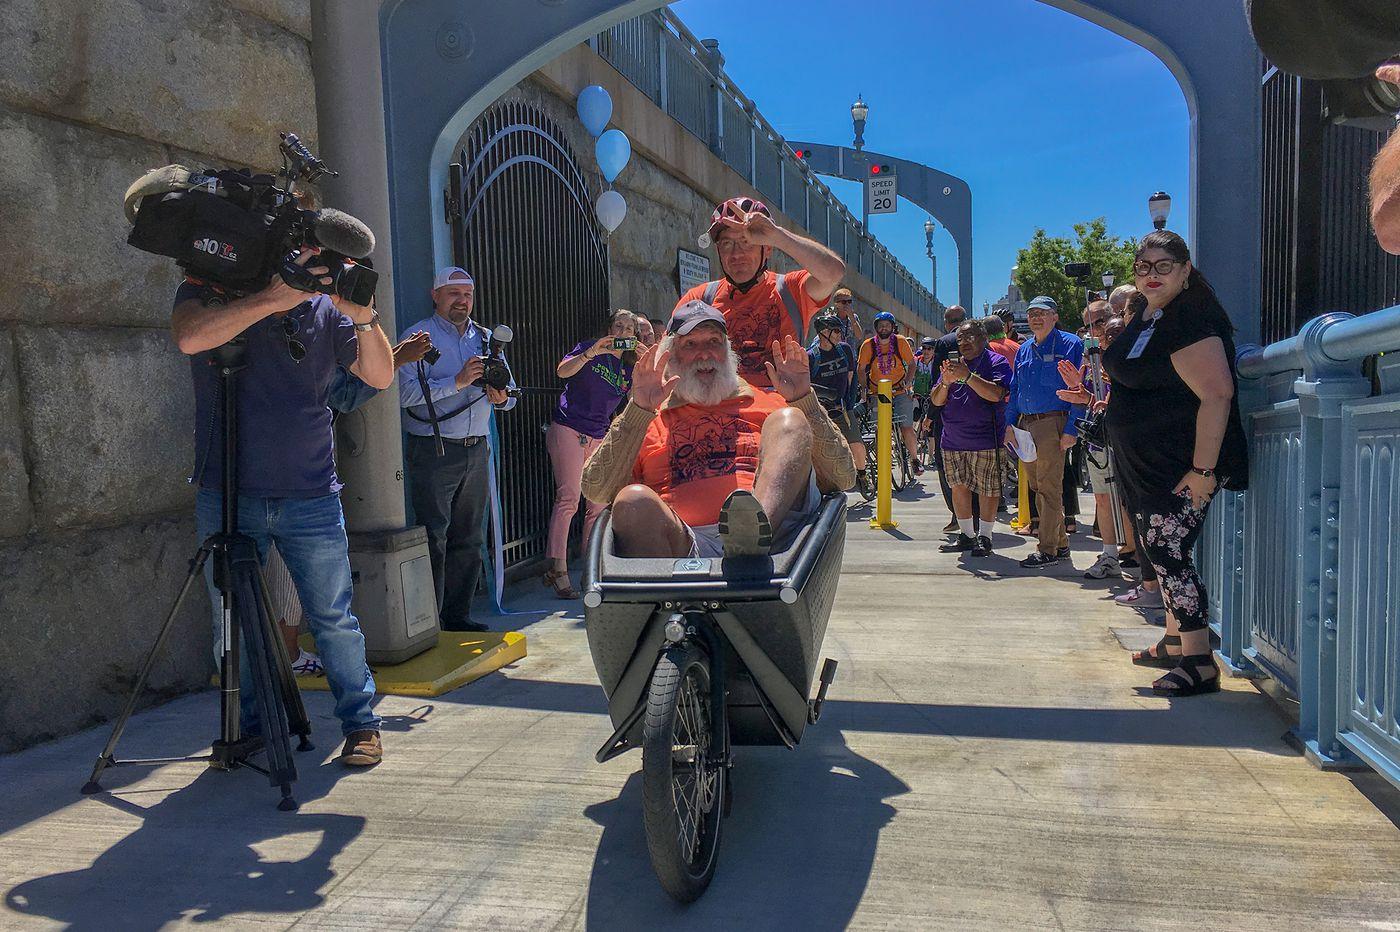 Cyclists celebrate opening of Ben Franklin Bridge ramp